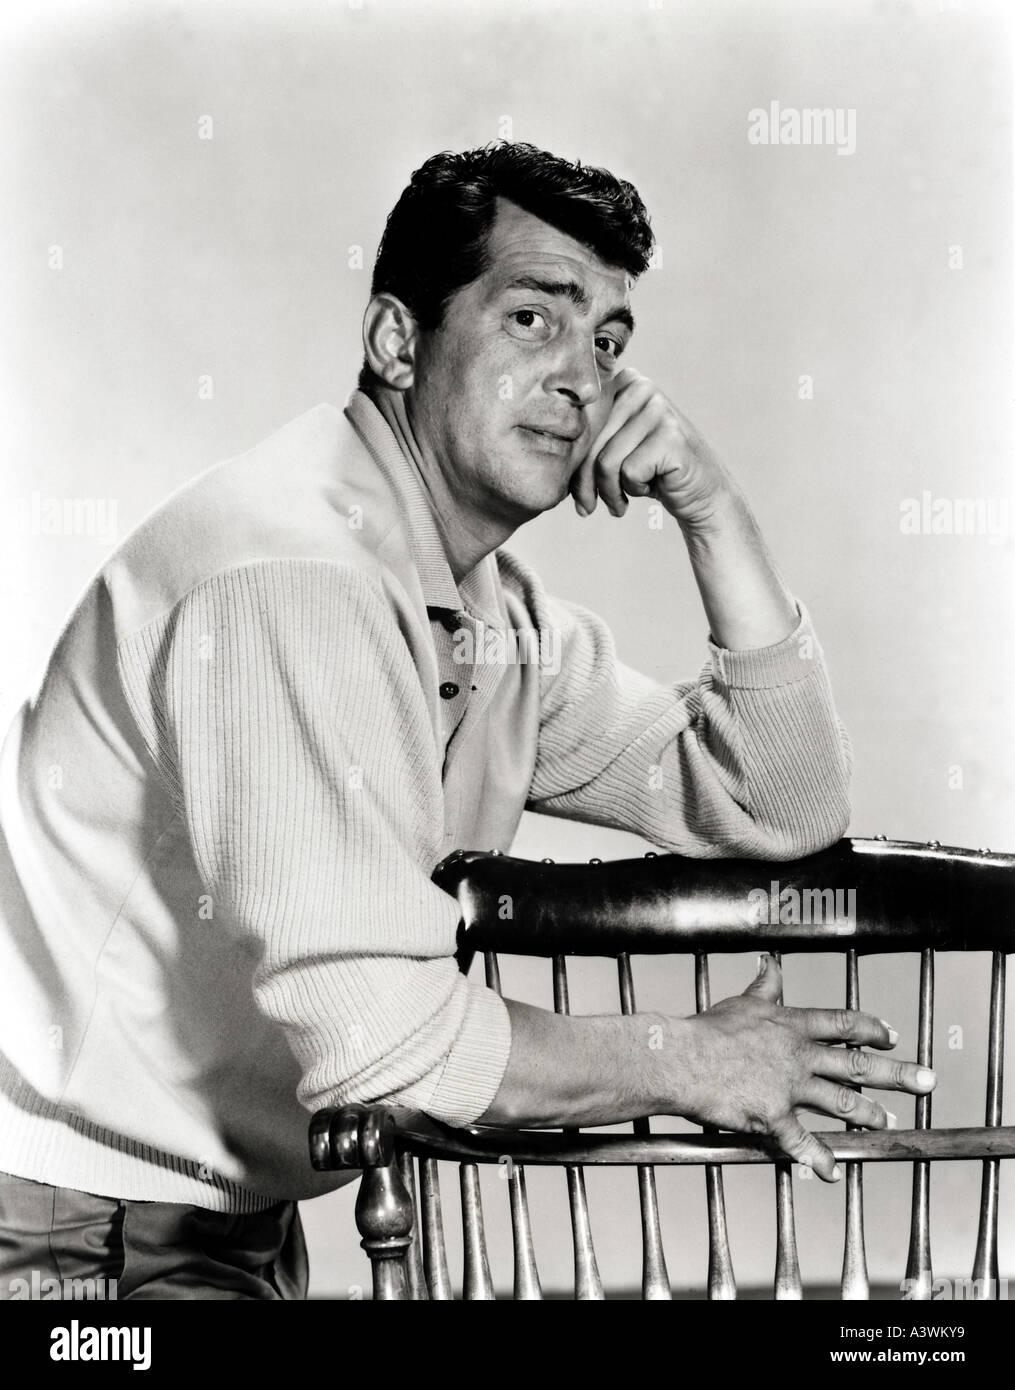 DEAN MARTIN  -  US singer/actor - Stock Image